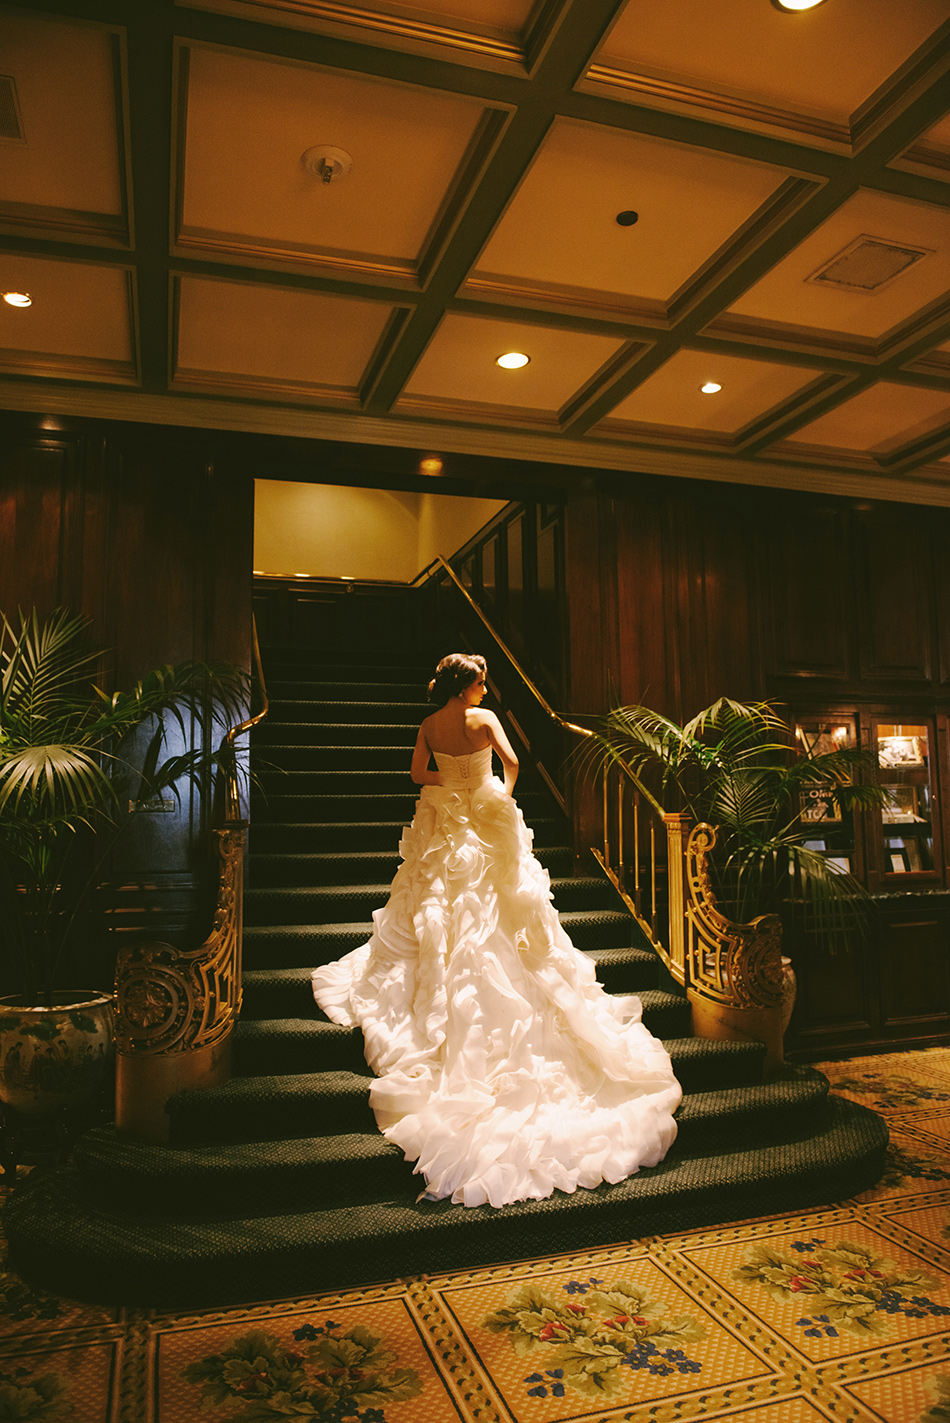 AD Passion Photography | stephany-and-nathan-wedding-dallas_074 | Adelin, Dida, fotograf profesionist, fotograf de nunta, fotografie de nunta, fotograf Timisoara, fotograf Craiova, fotograf Bucuresti, fotograf Arad, nunta Timisoara, nunta Arad, nunta Bucuresti, nunta Craiova